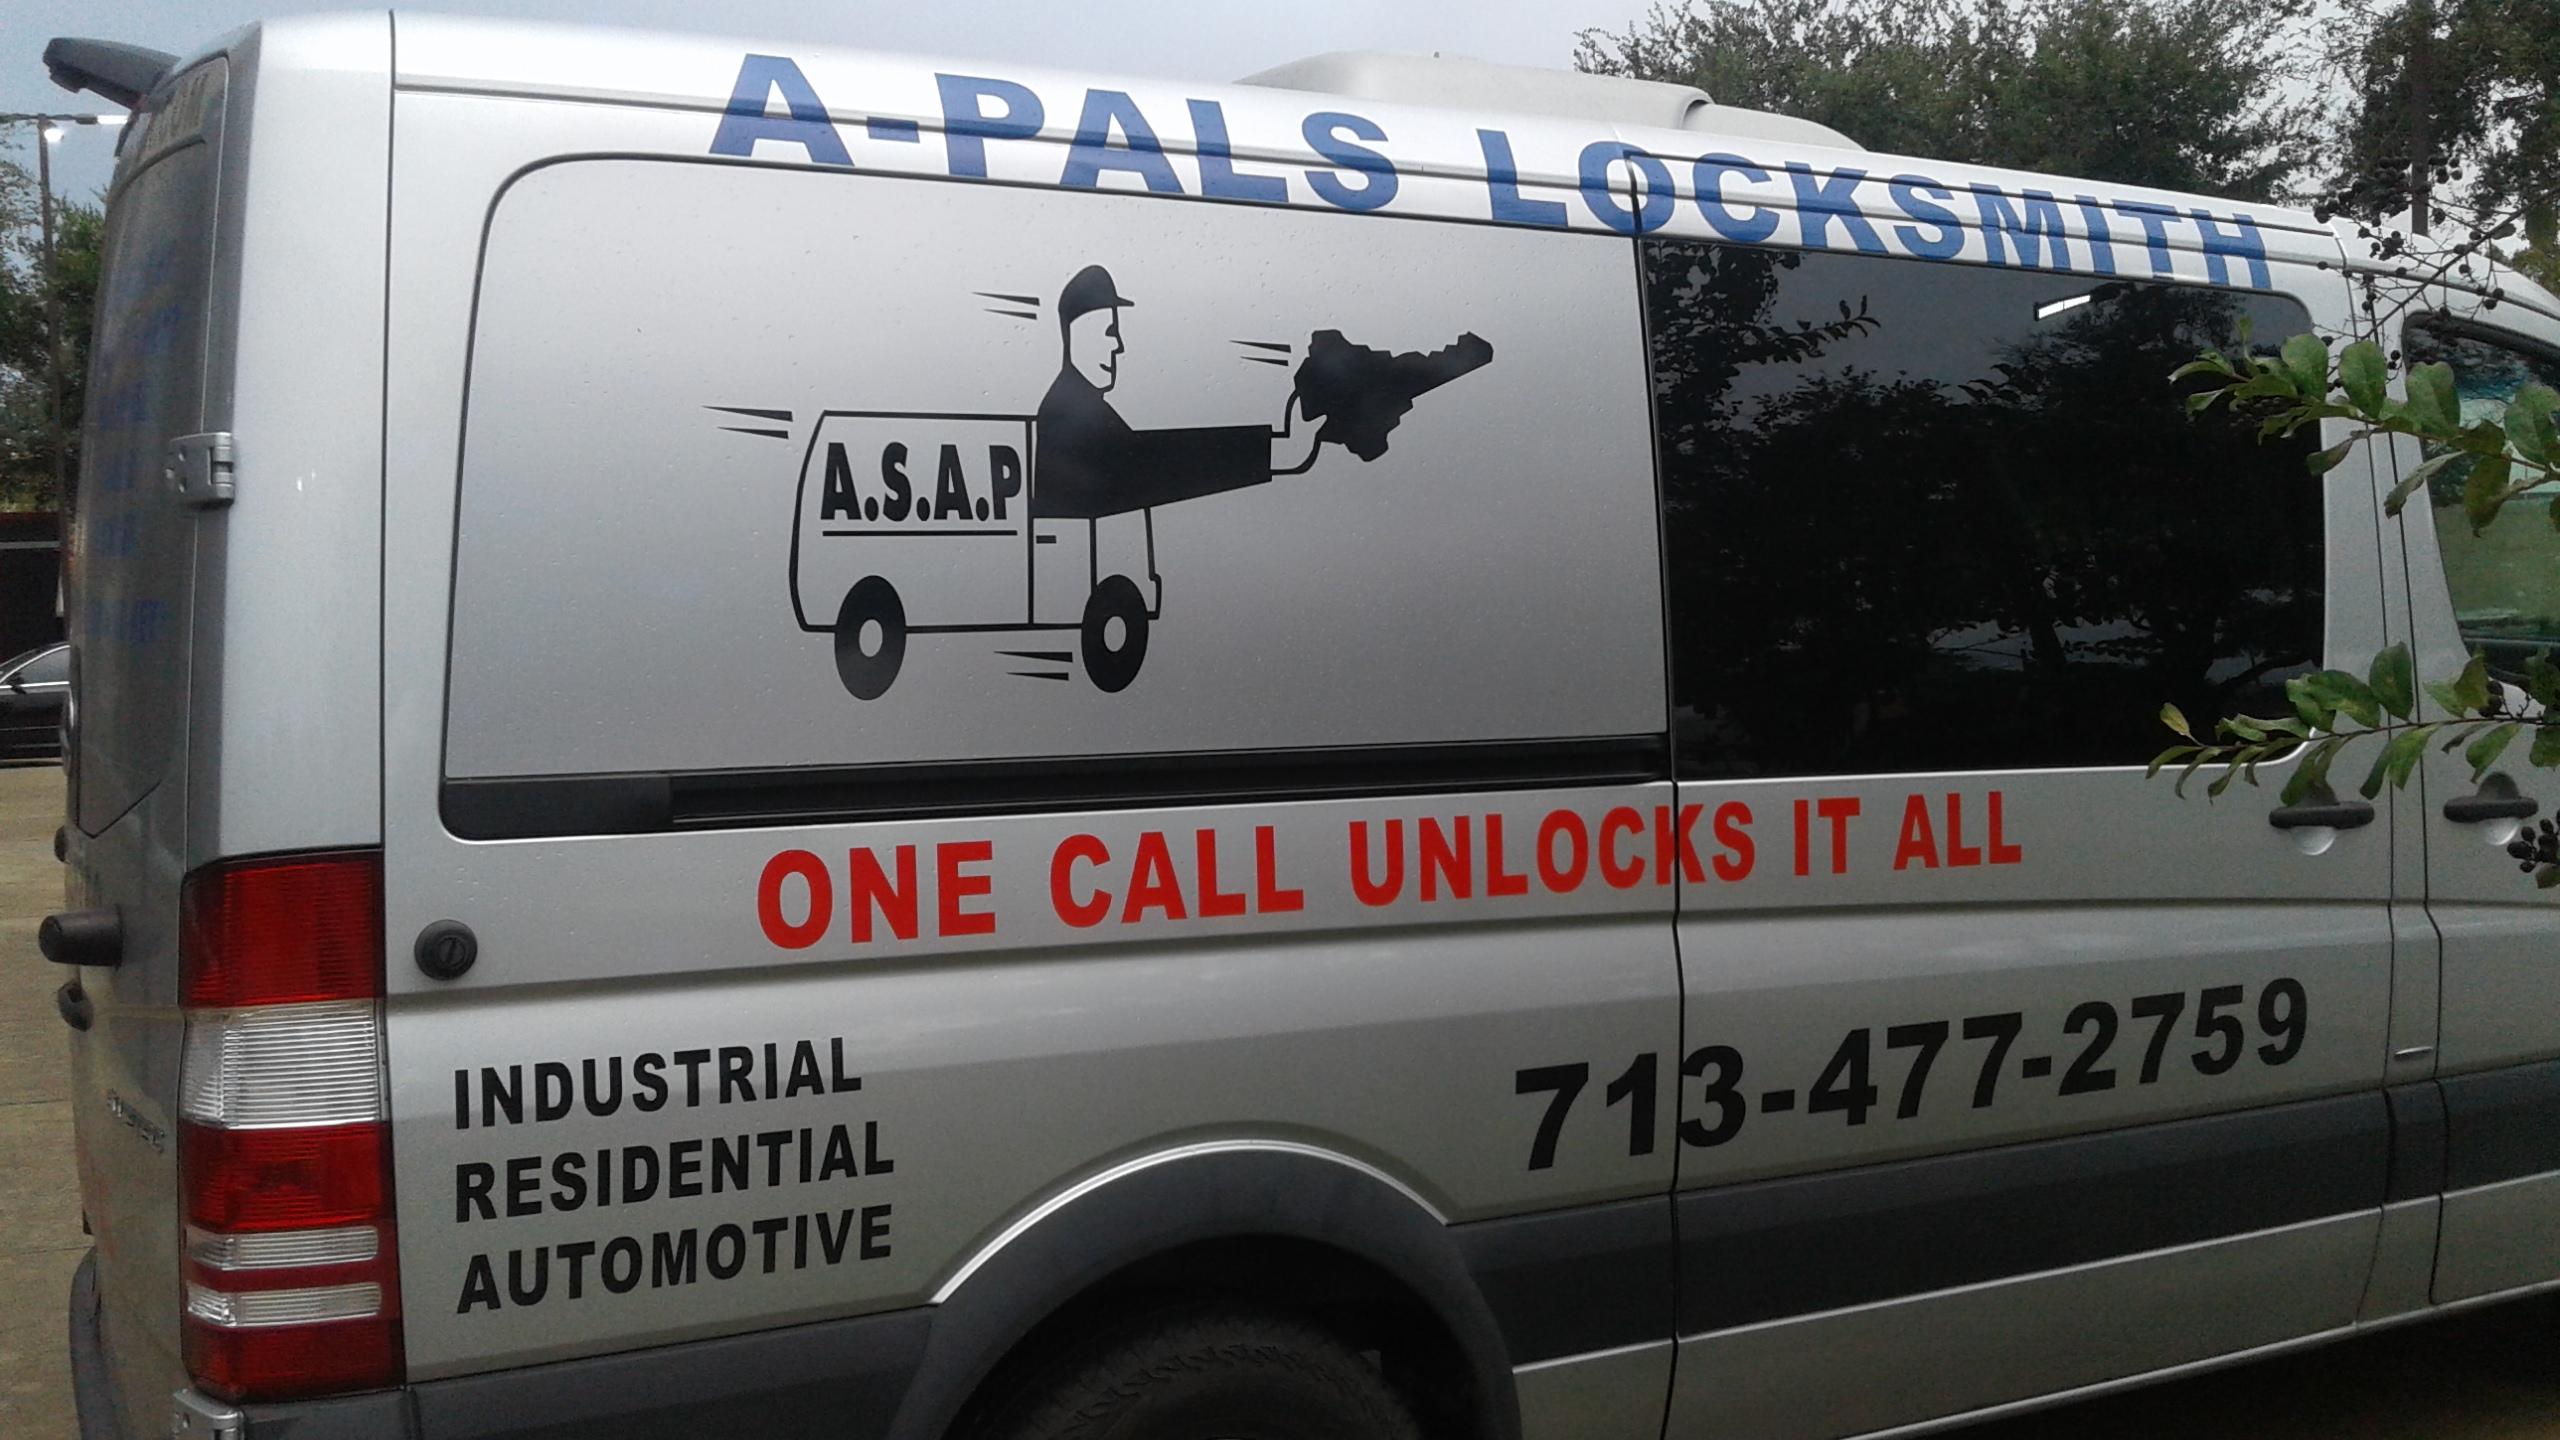 A-Pals Locksmith